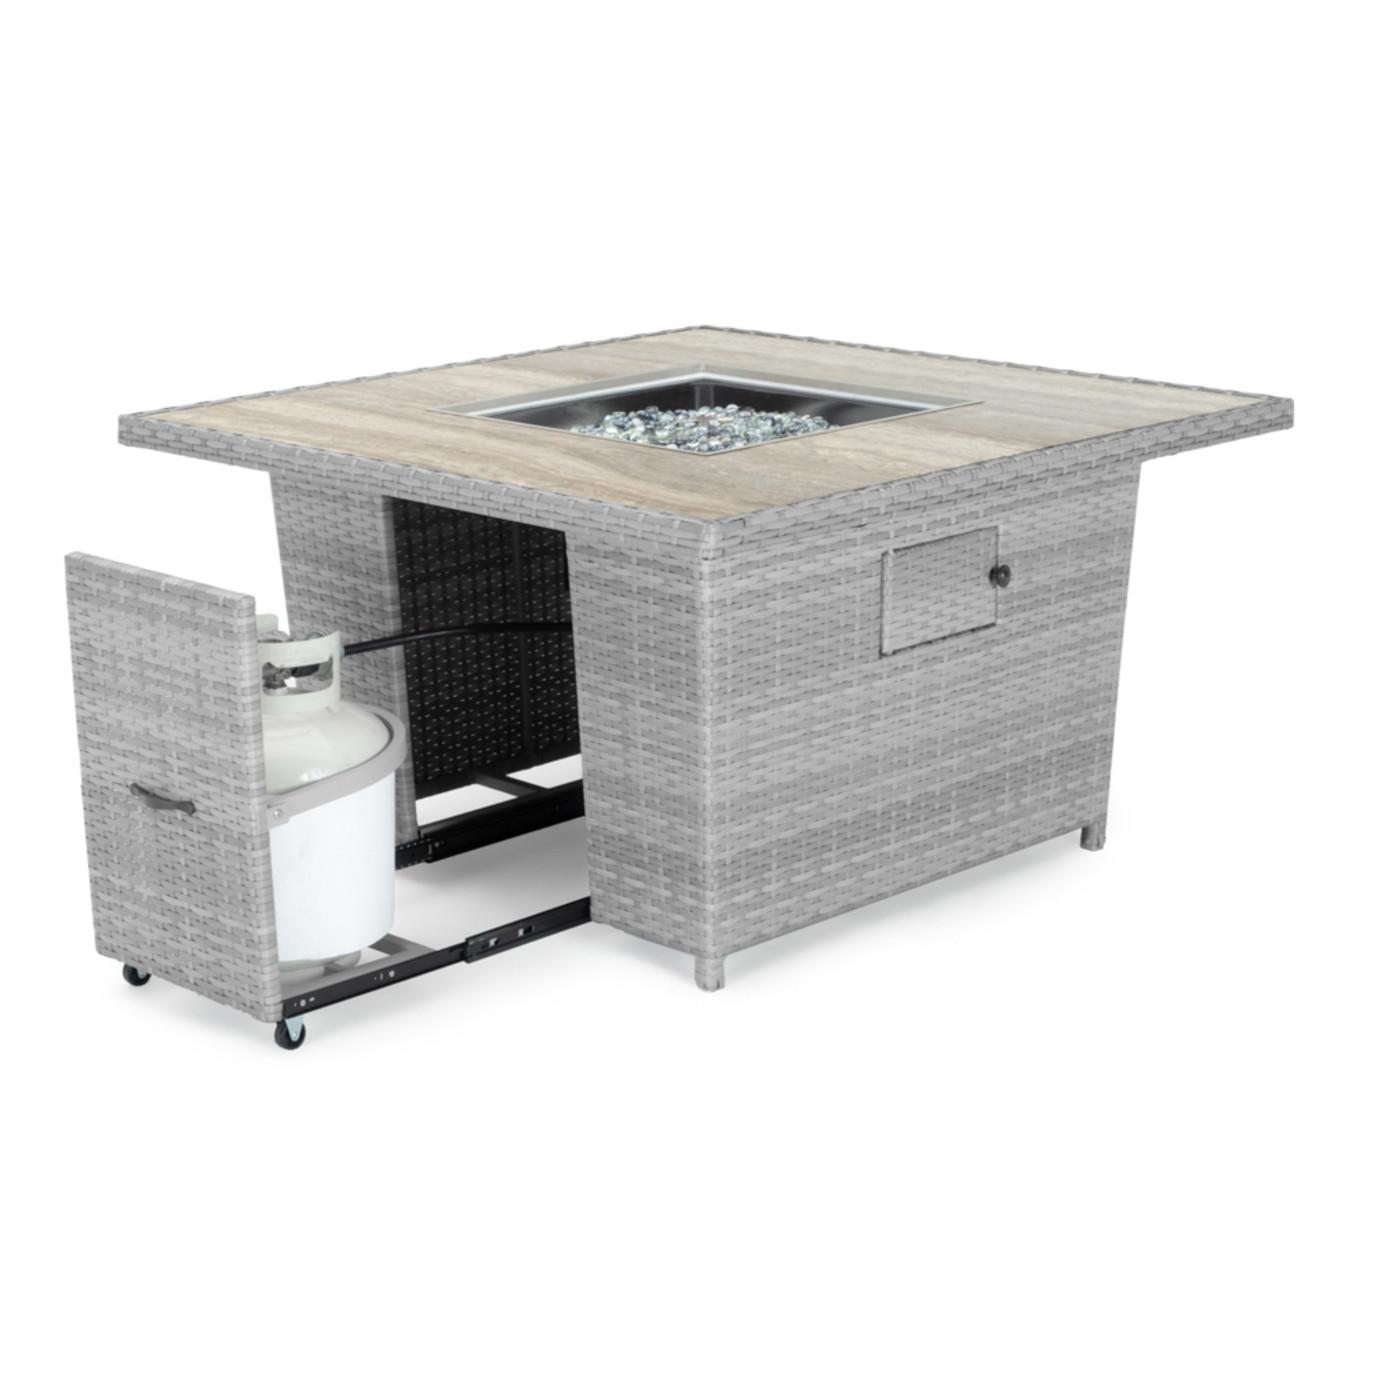 Portofino® Comfort 6pc Sectional & Fire Table - Laguna Blue